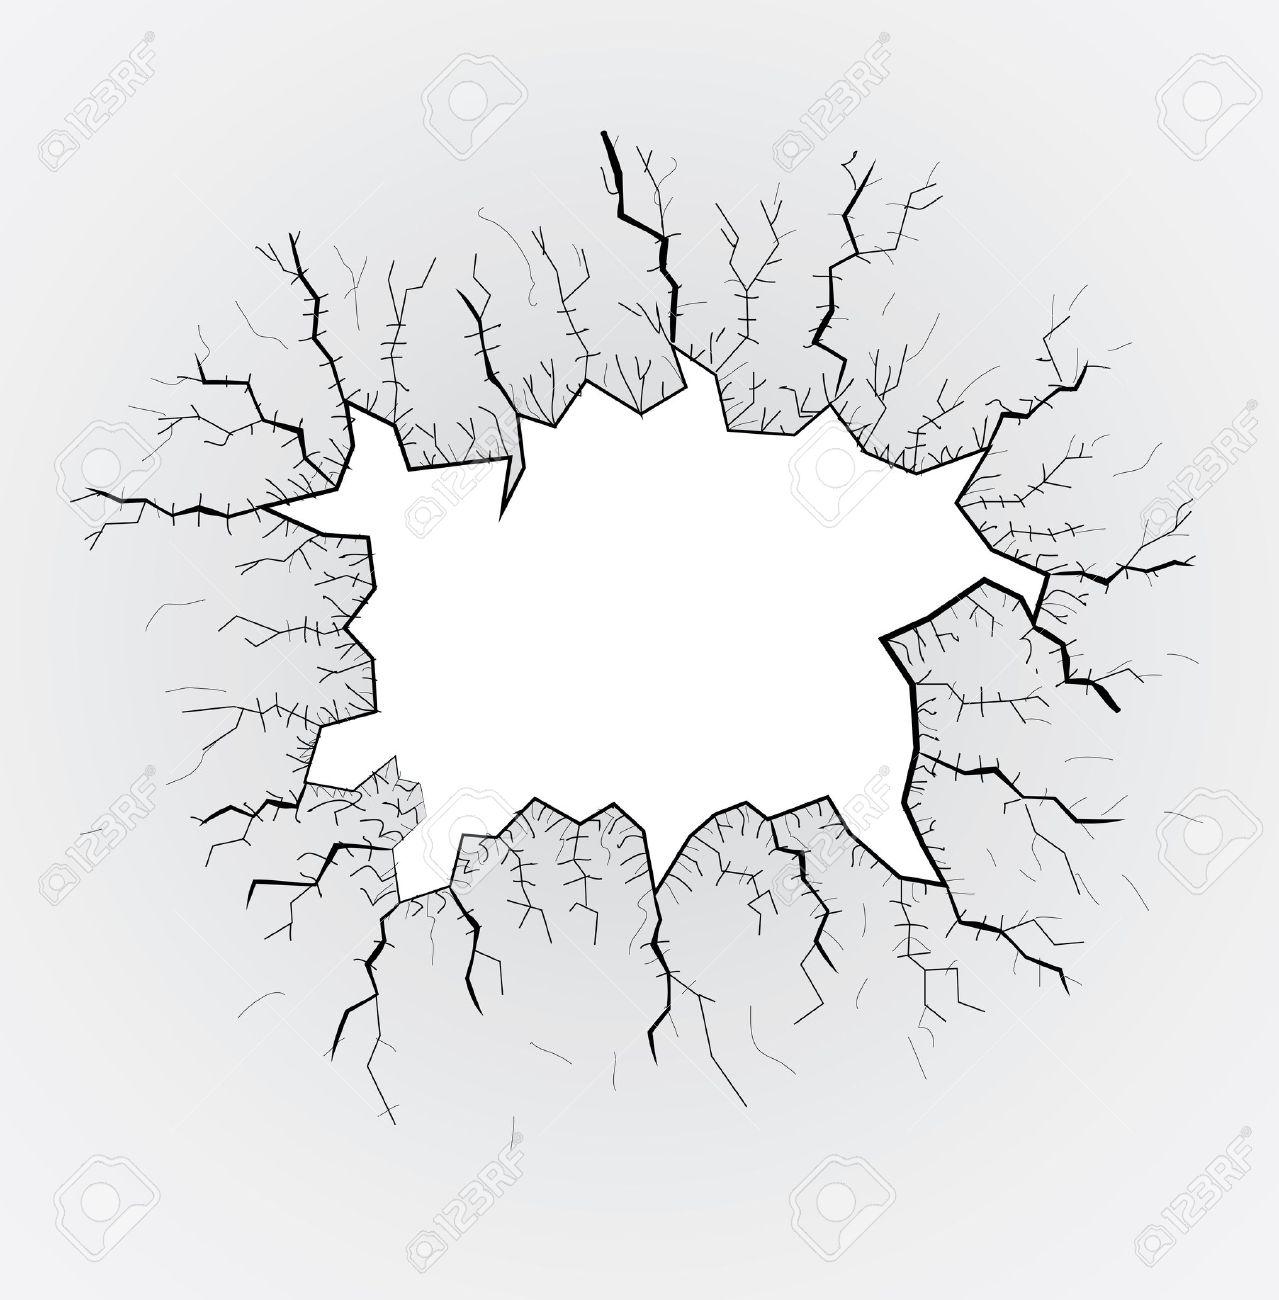 broken glass table, cracks, illustration.